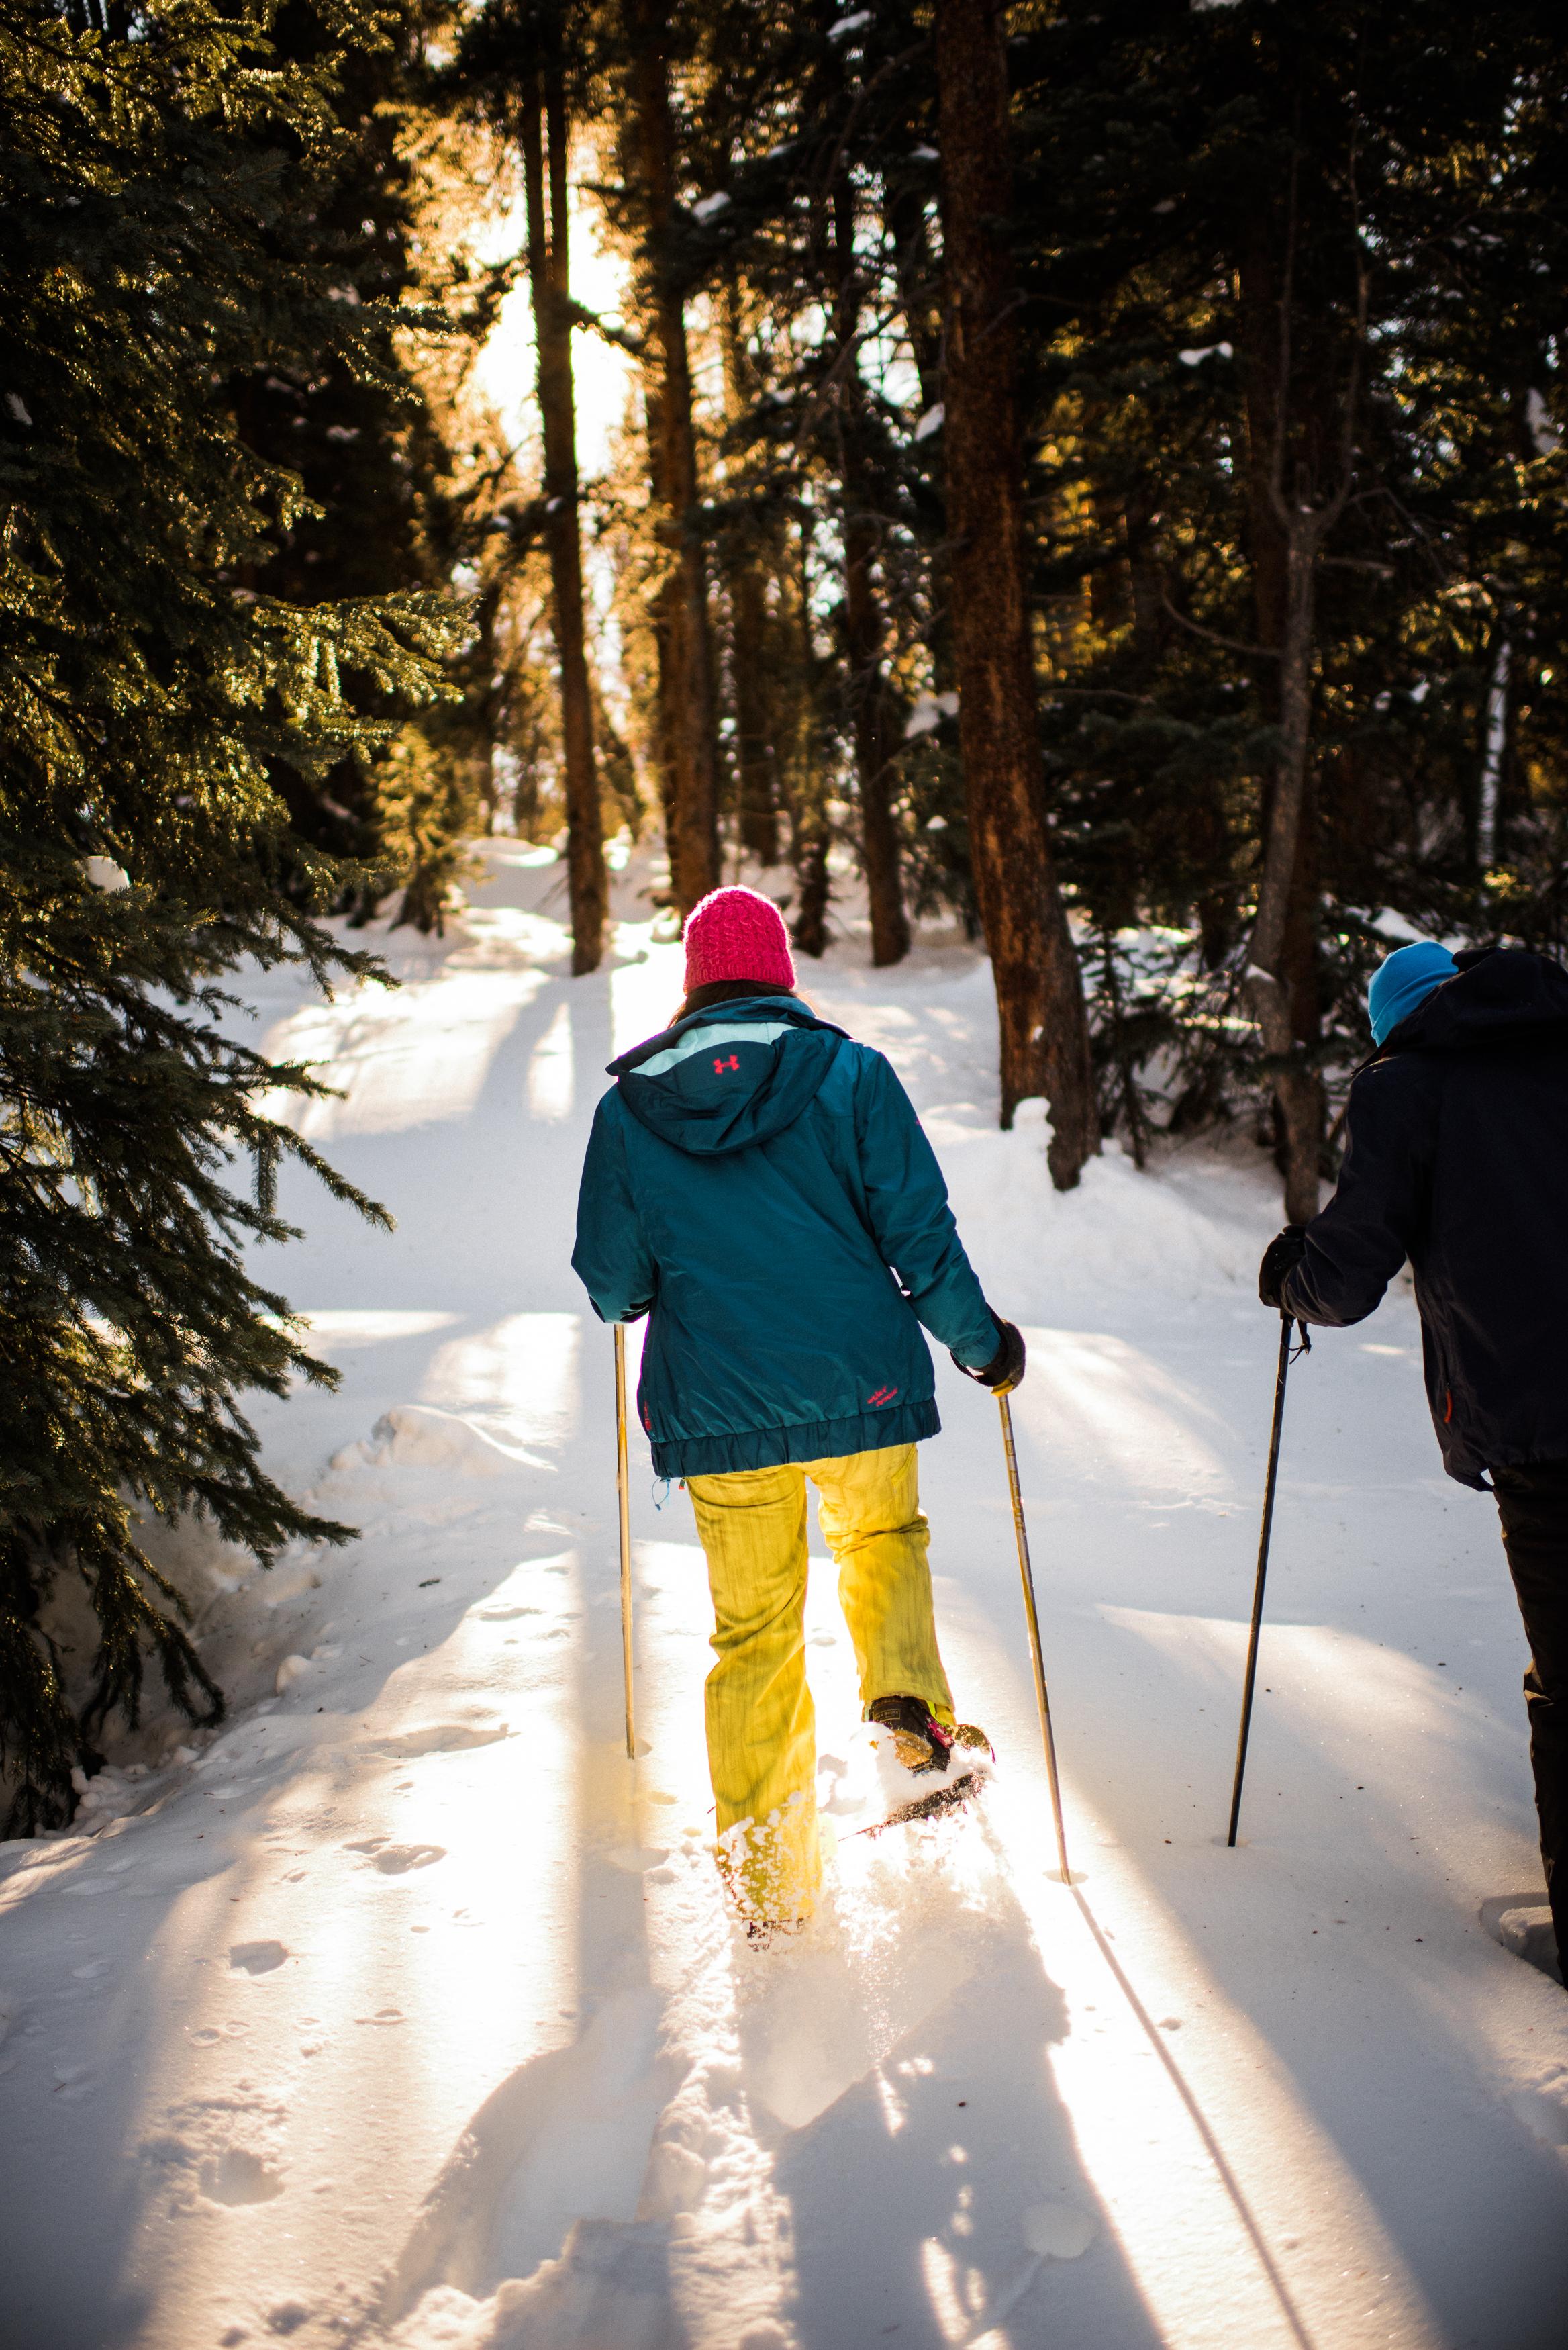 TaraShupe_Outdoor_Photographer_Loweprobags_Colorado_Copper_Mountains_Ski_84.jpg